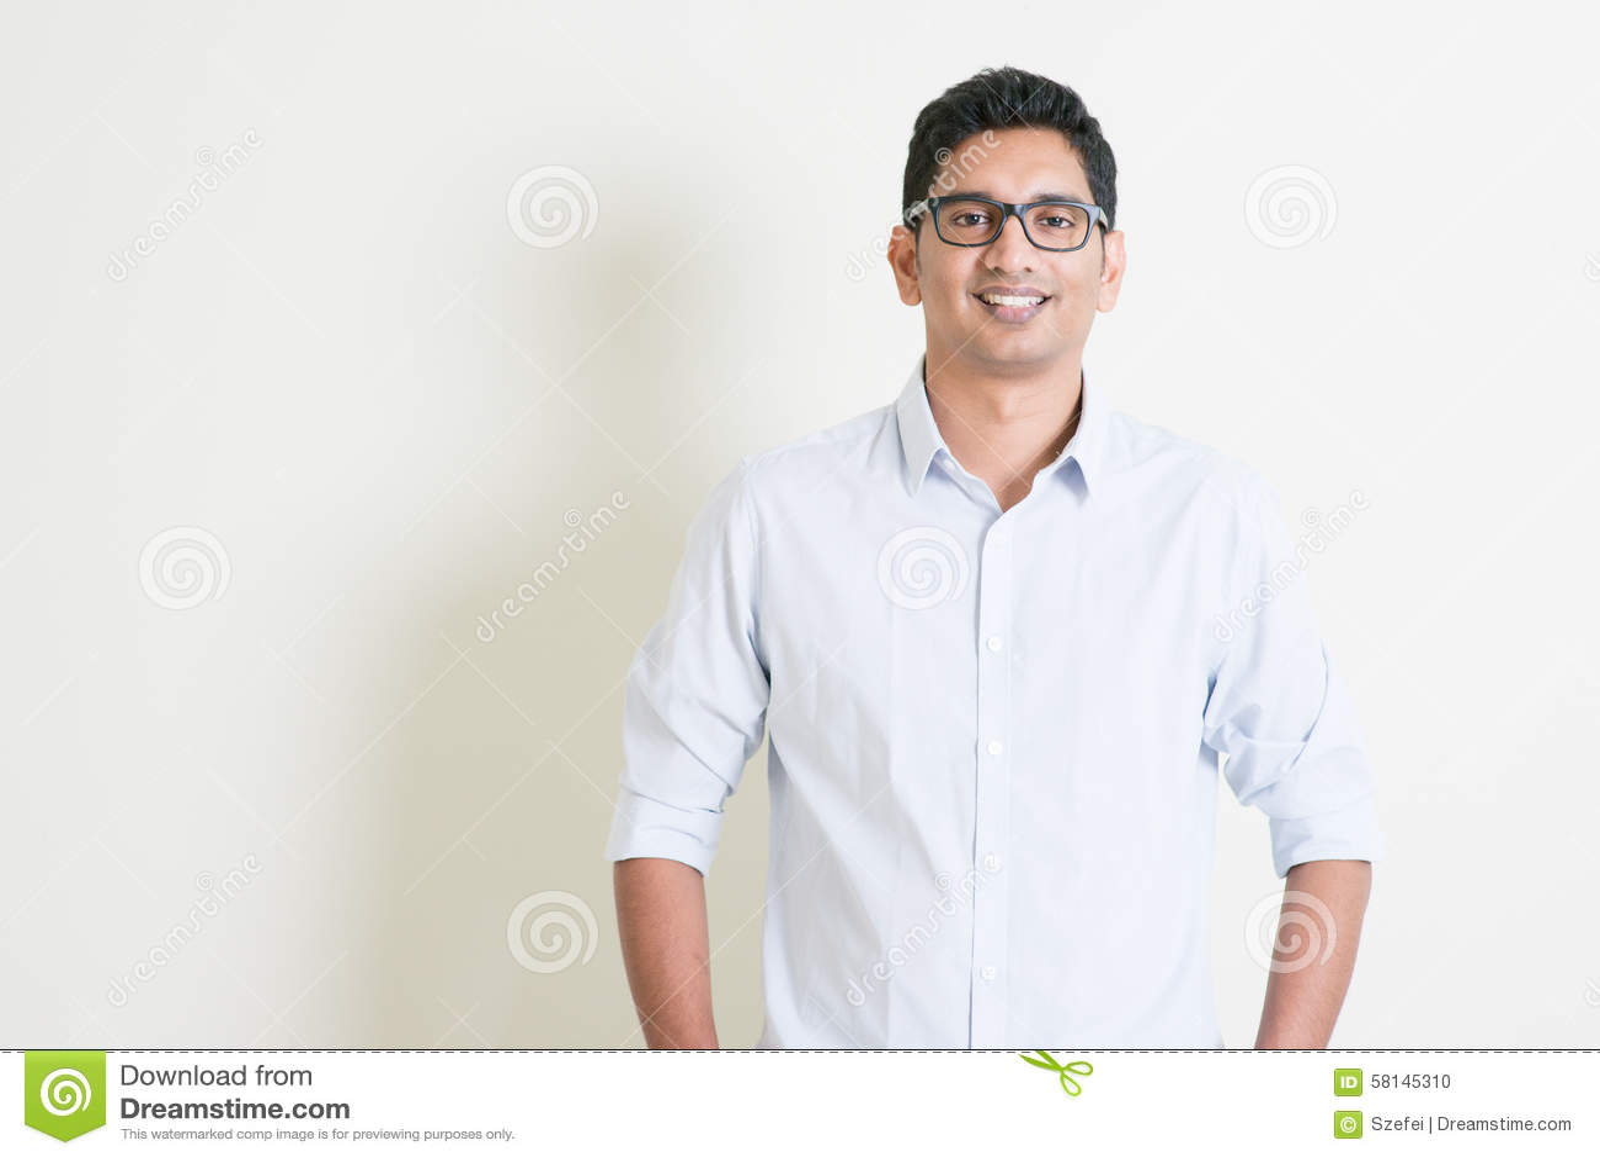 hindu single men in commerce Hindu dating, hindu matrimonial, hindu marriage, free site, wedding, dating, canada, uk, religion, indian, temple, brahmin, love.